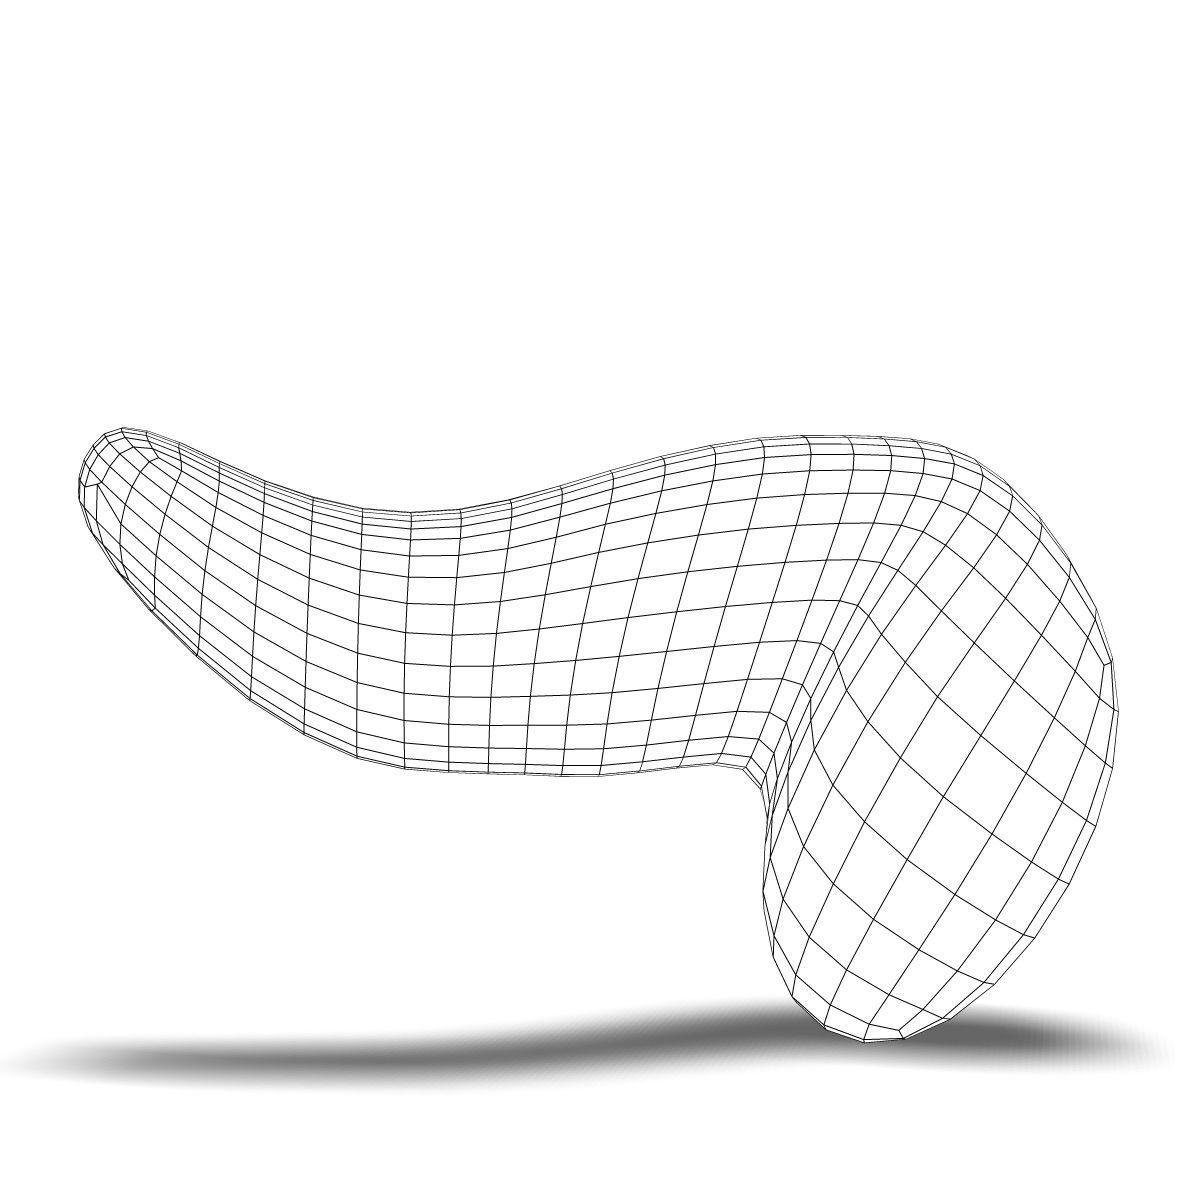 Human Pancreas Anatomy 3d Body Cgtrader Bicycle Diagram Model